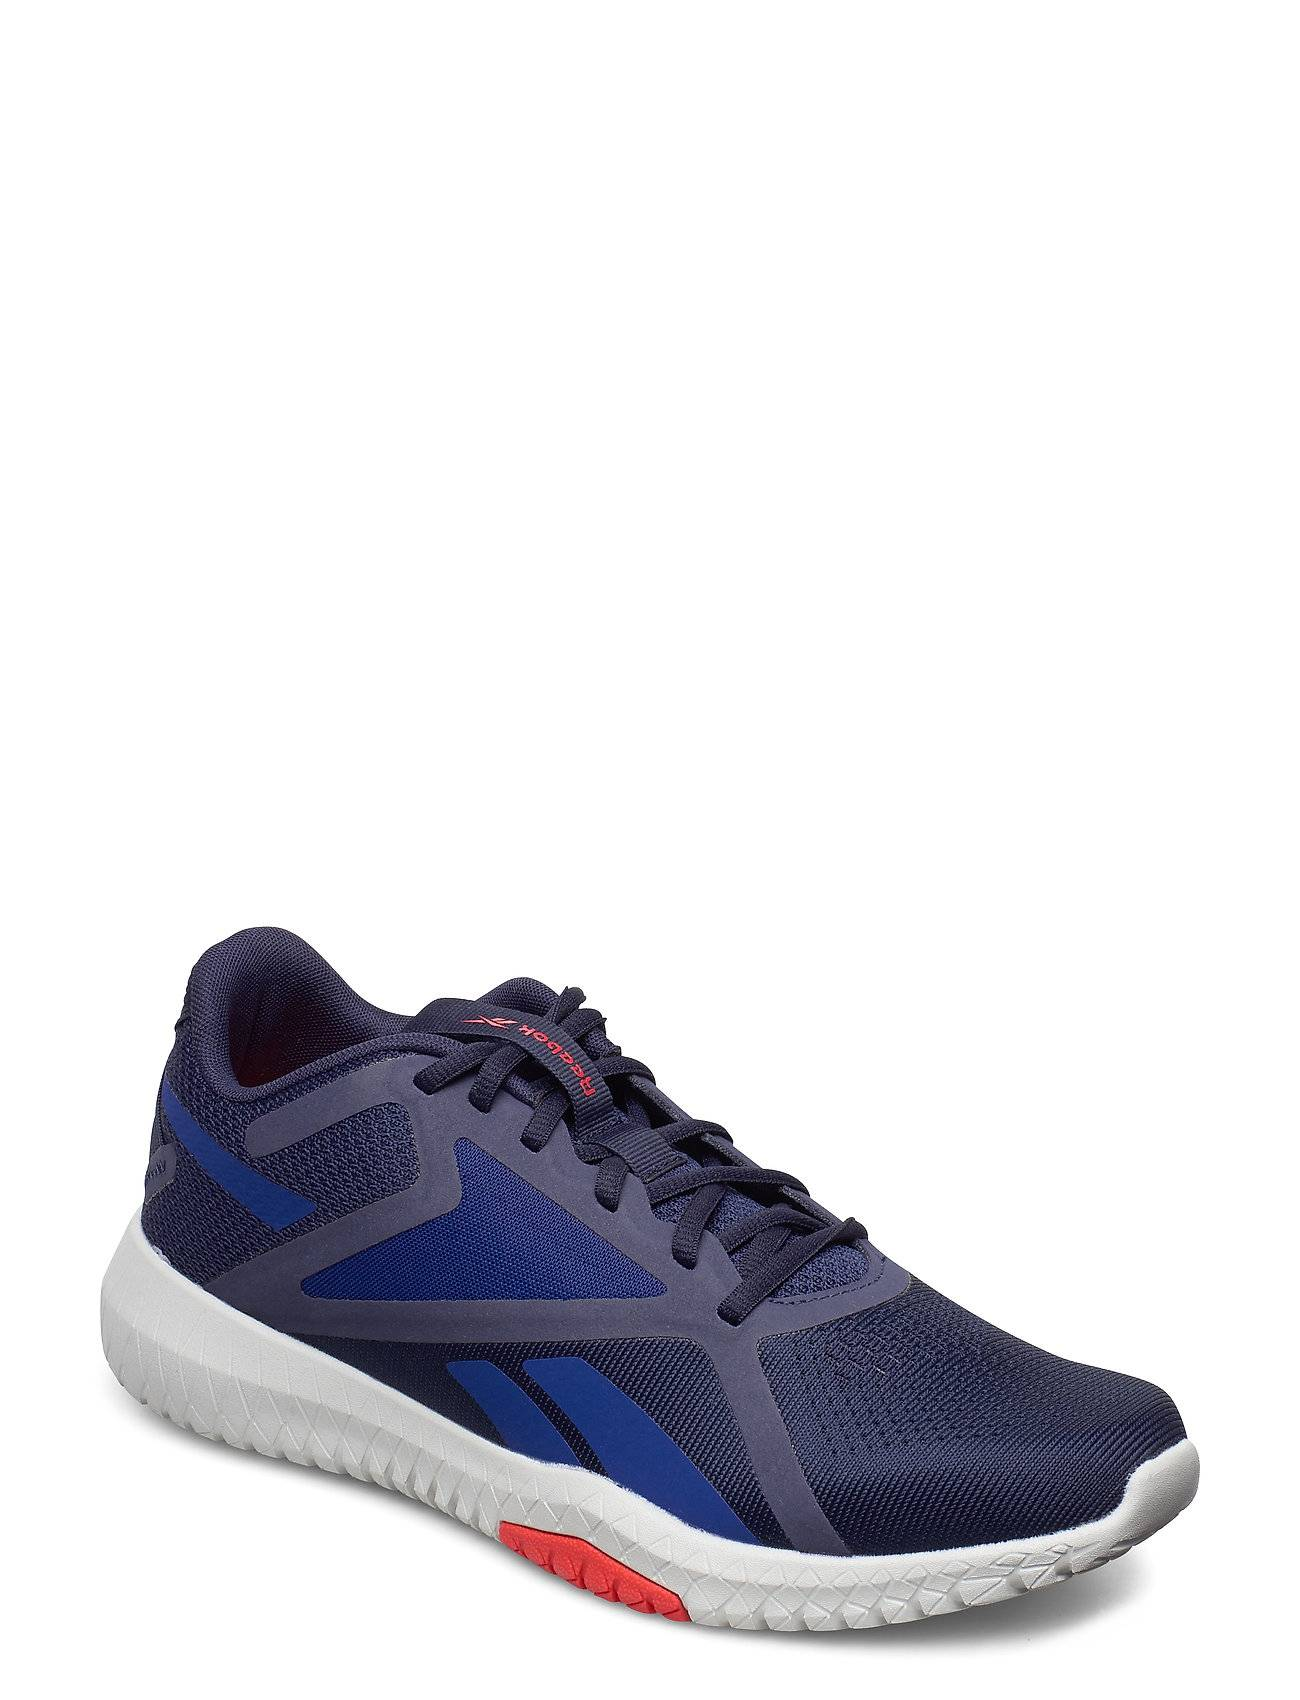 Reebok Performance Reebok Flexagon Force 2.0 Shoes Sport Shoes Training Shoes- Golf/tennis/fitness Sininen Reebok Performance